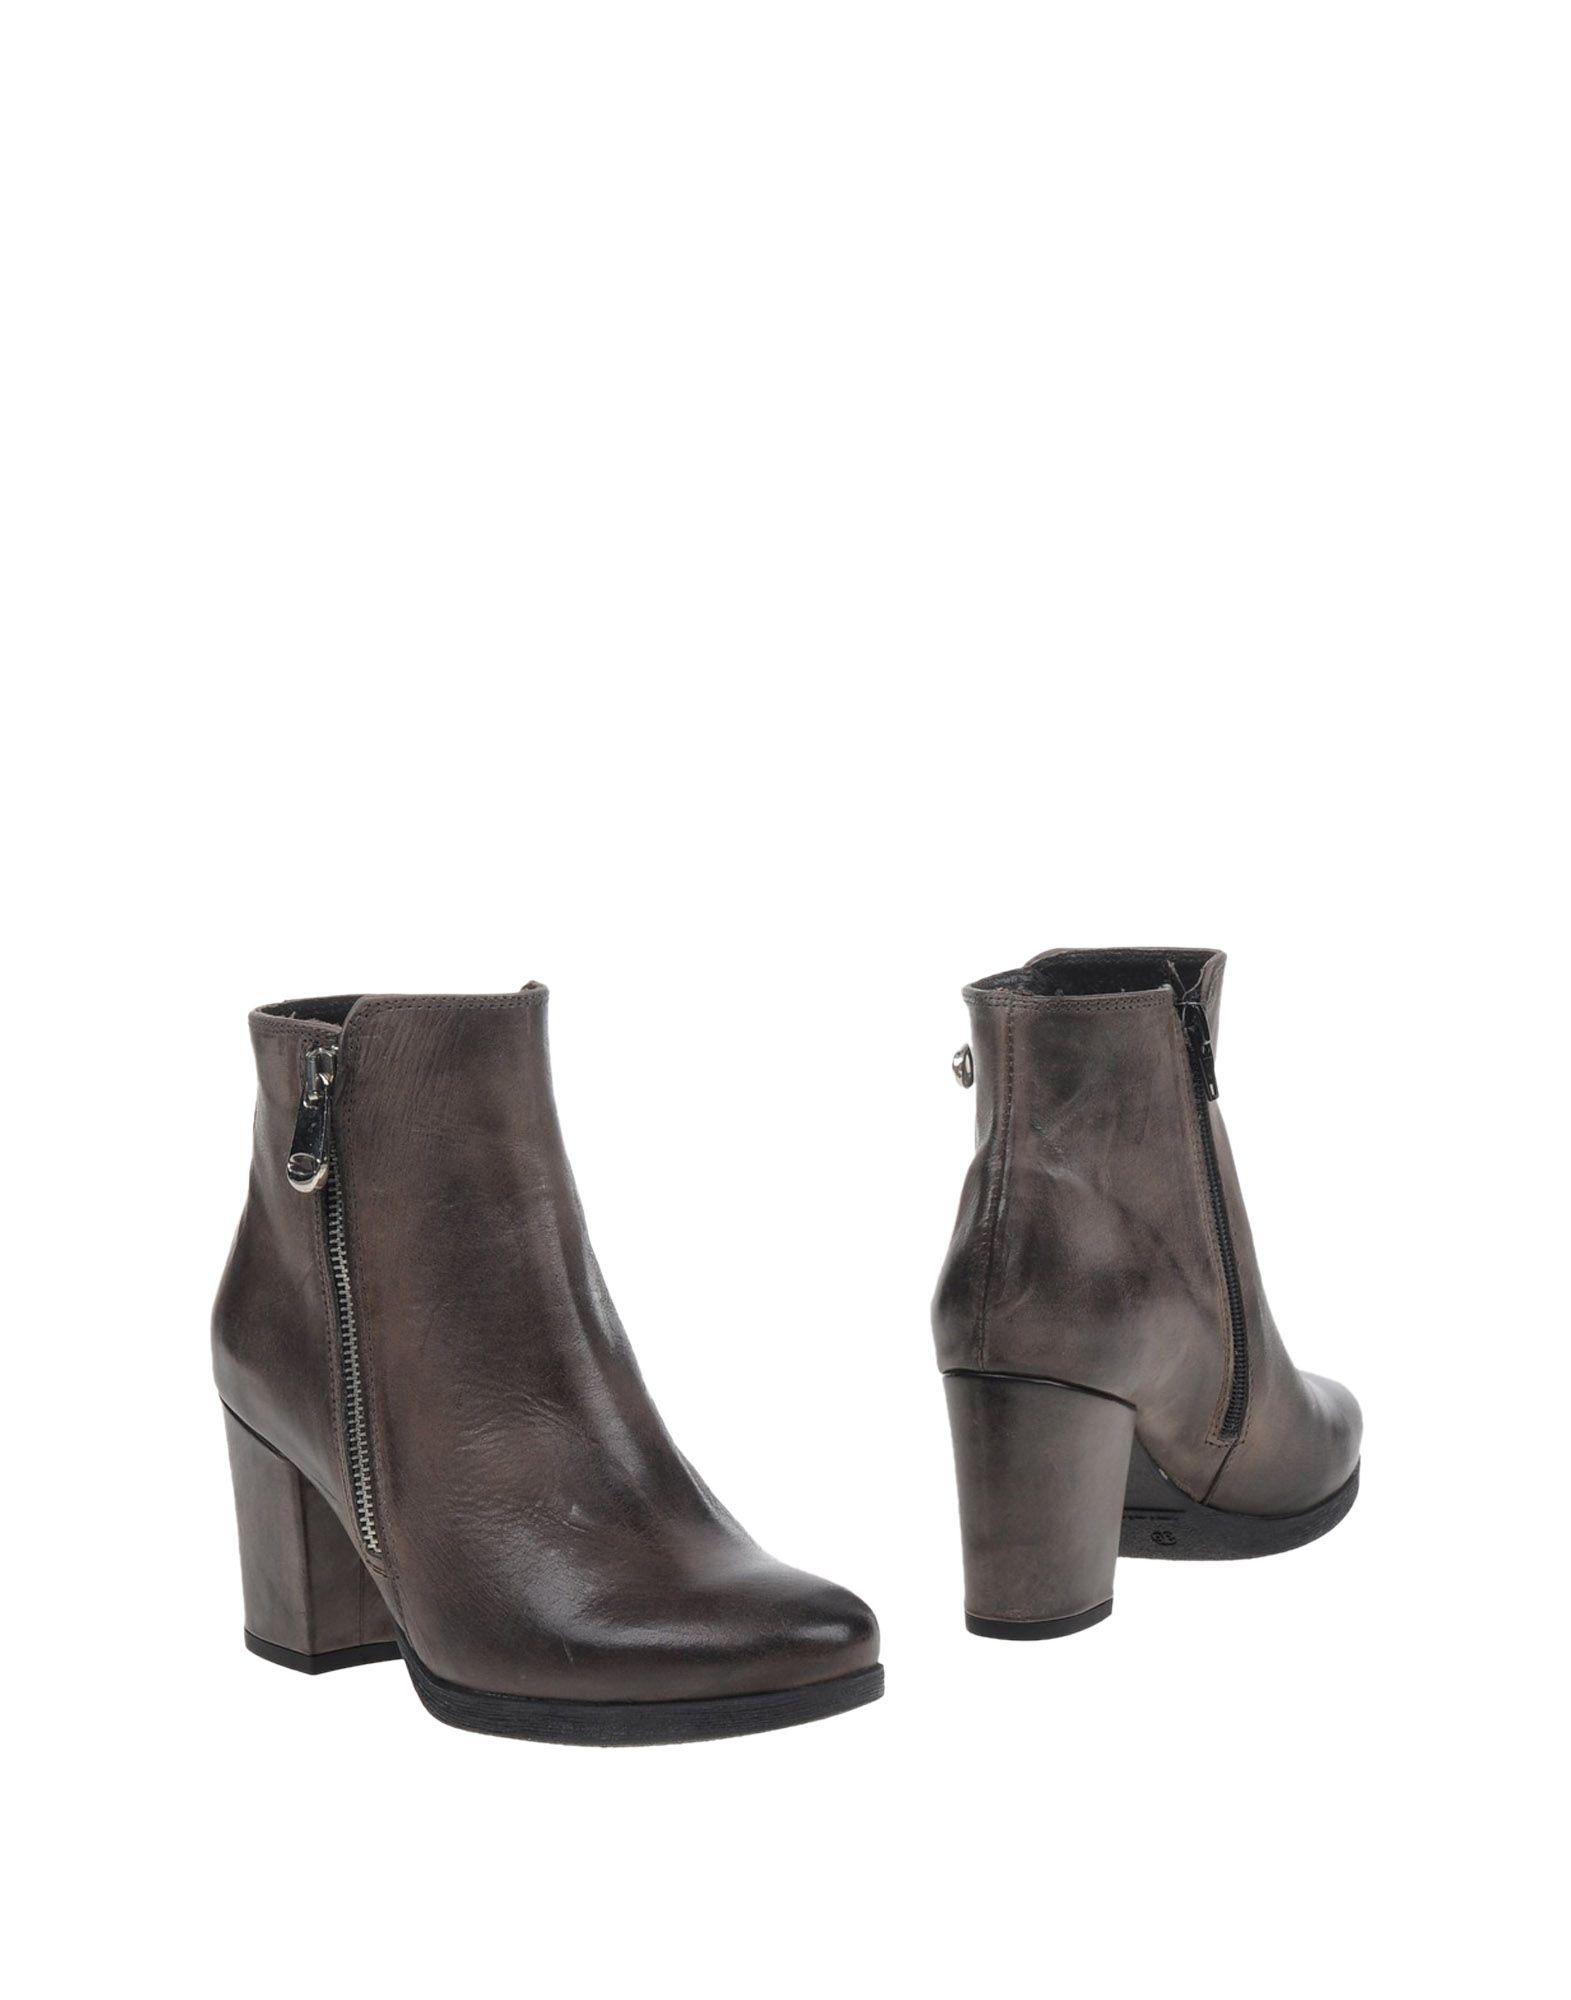 Cafènoir Stiefelette Damen  11028217BG beliebte Gute Qualität beliebte 11028217BG Schuhe f00c6b